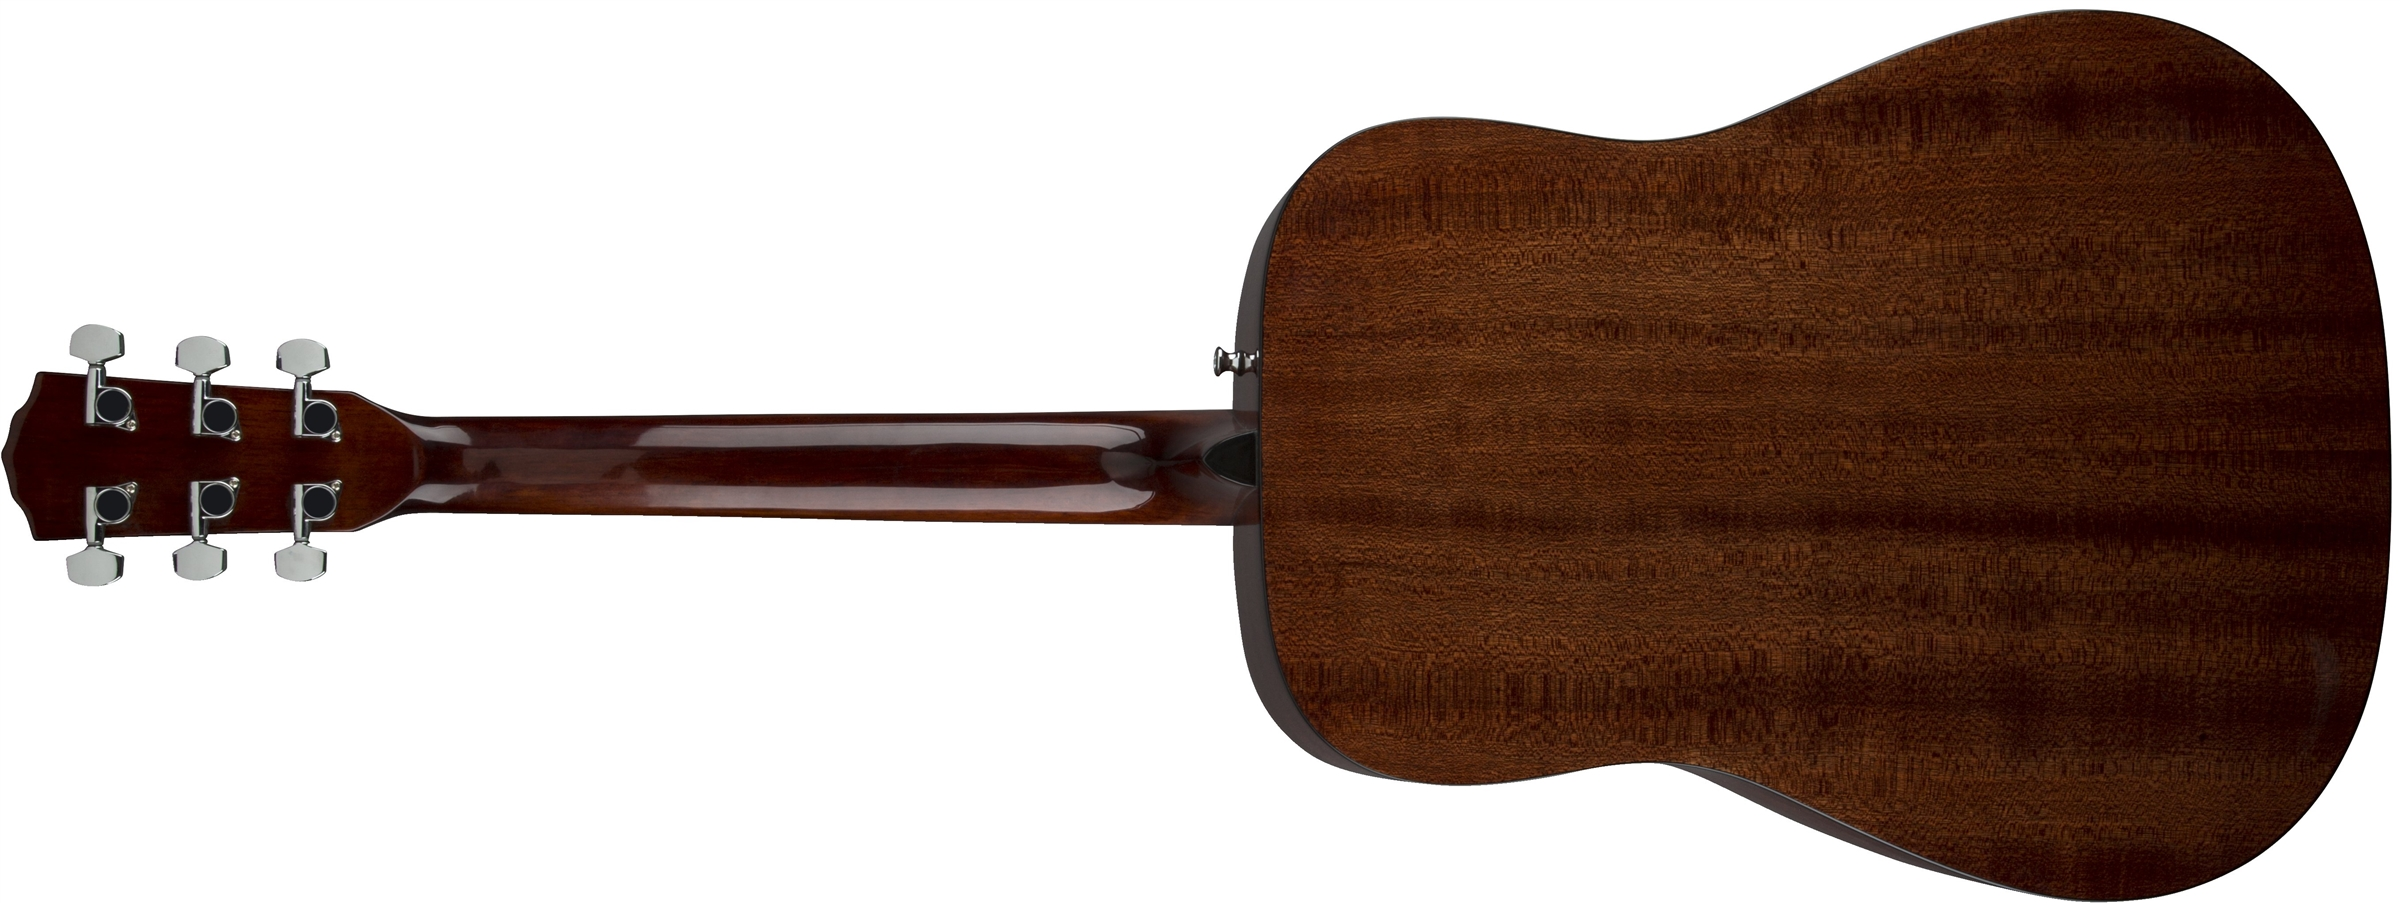 dg 8s acoustic pack natural fender acoustic guitars